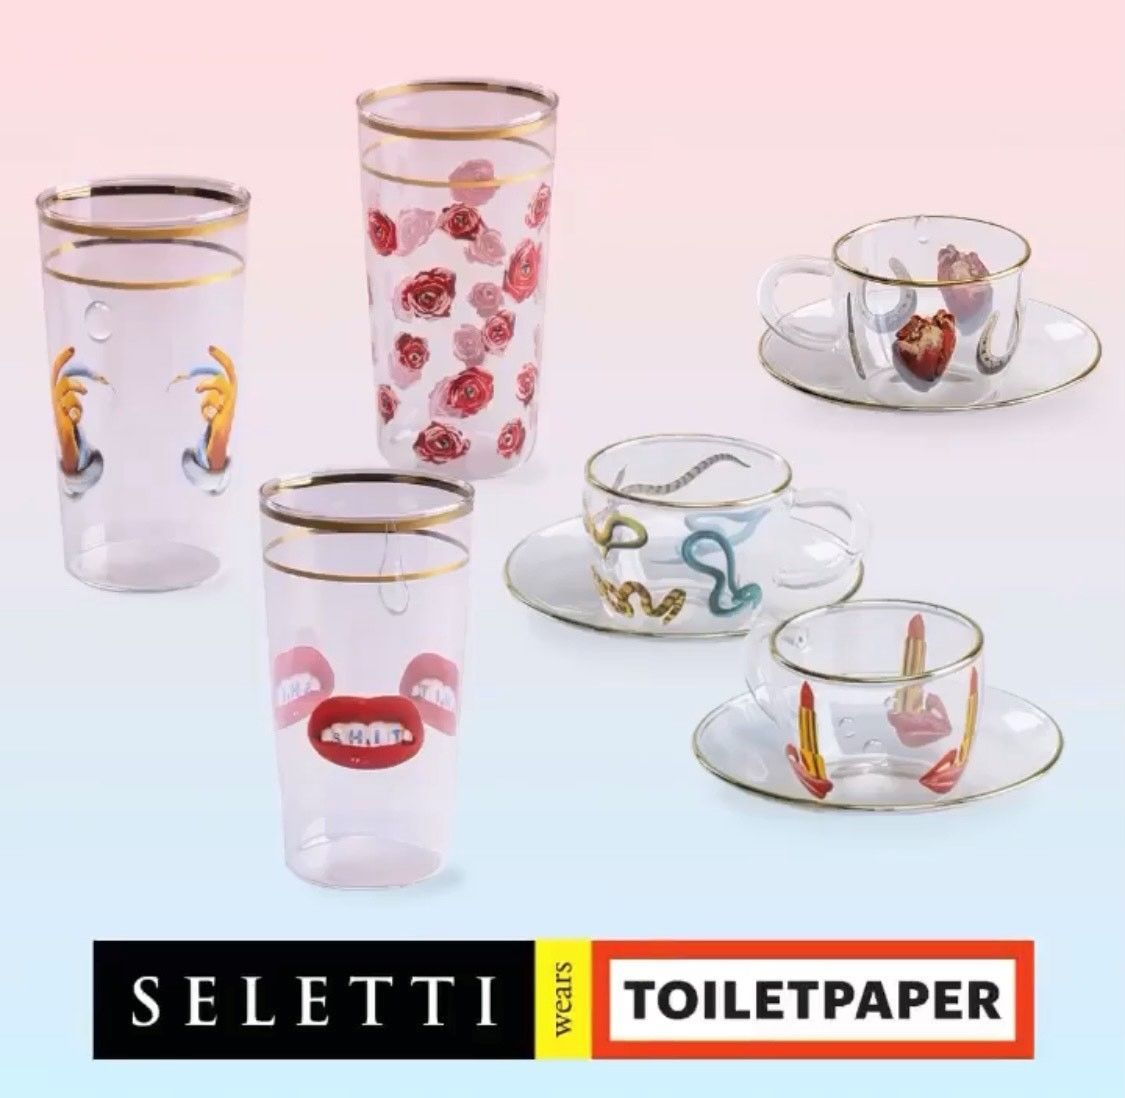 「SELETTI NEWS | 新商品入荷しました!!」の写真